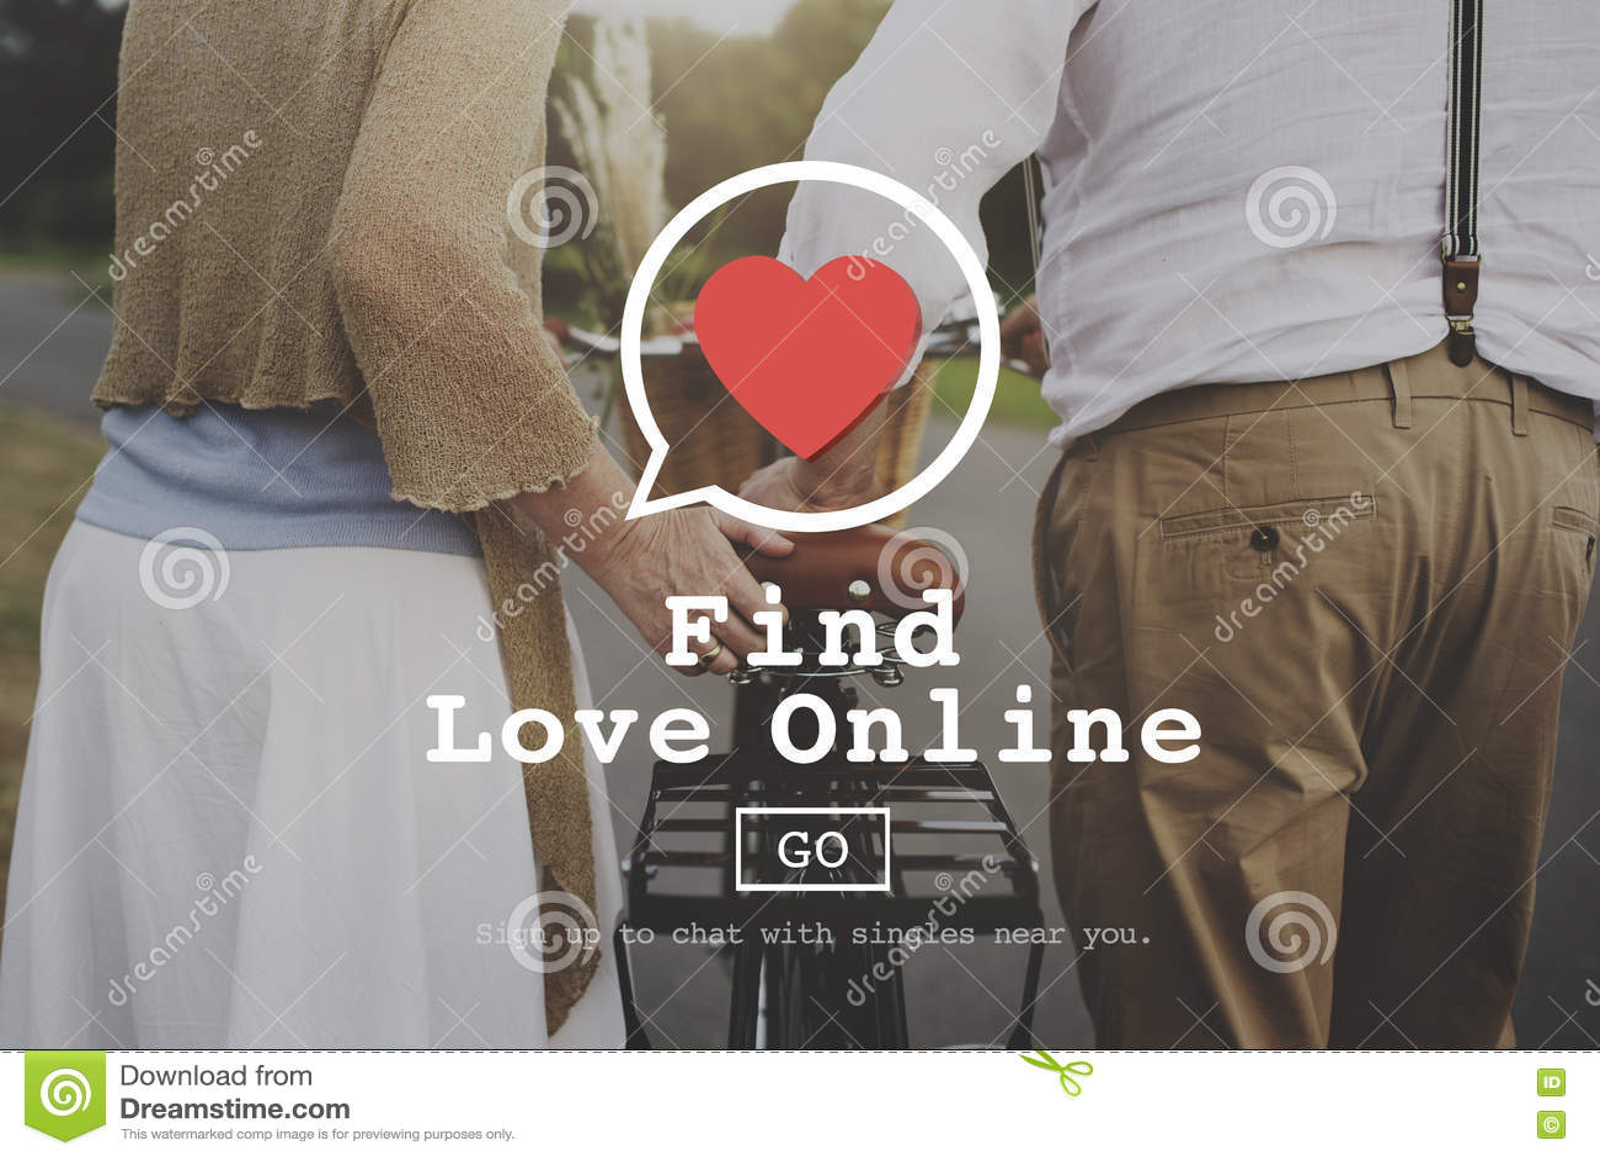 Online dating romantic